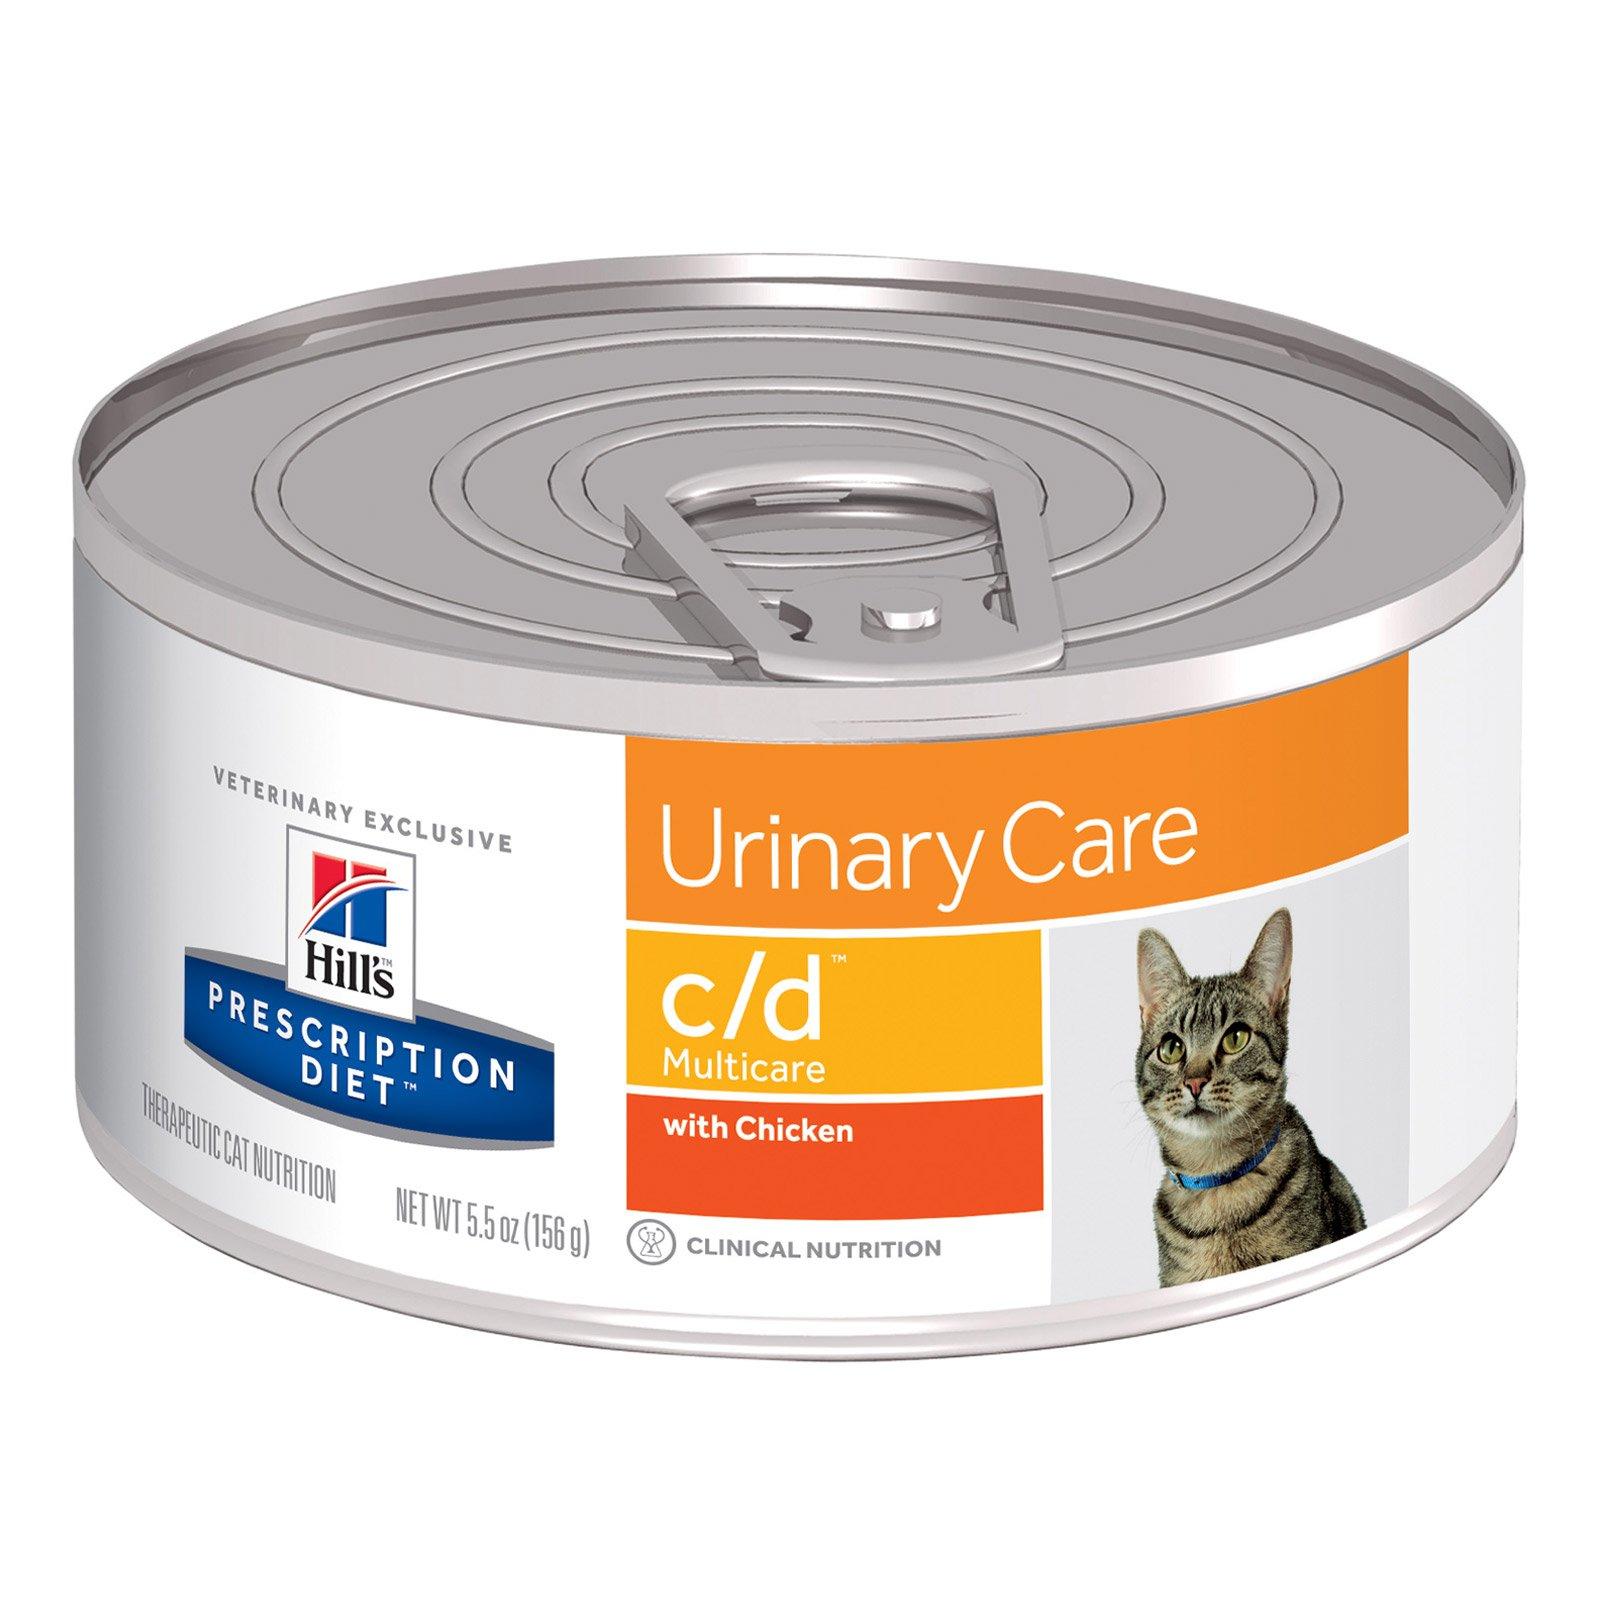 Hill's Prescription Diet c/d Multicare Urinary Care Canned Cat Food 156 Gm Original chicken flavour